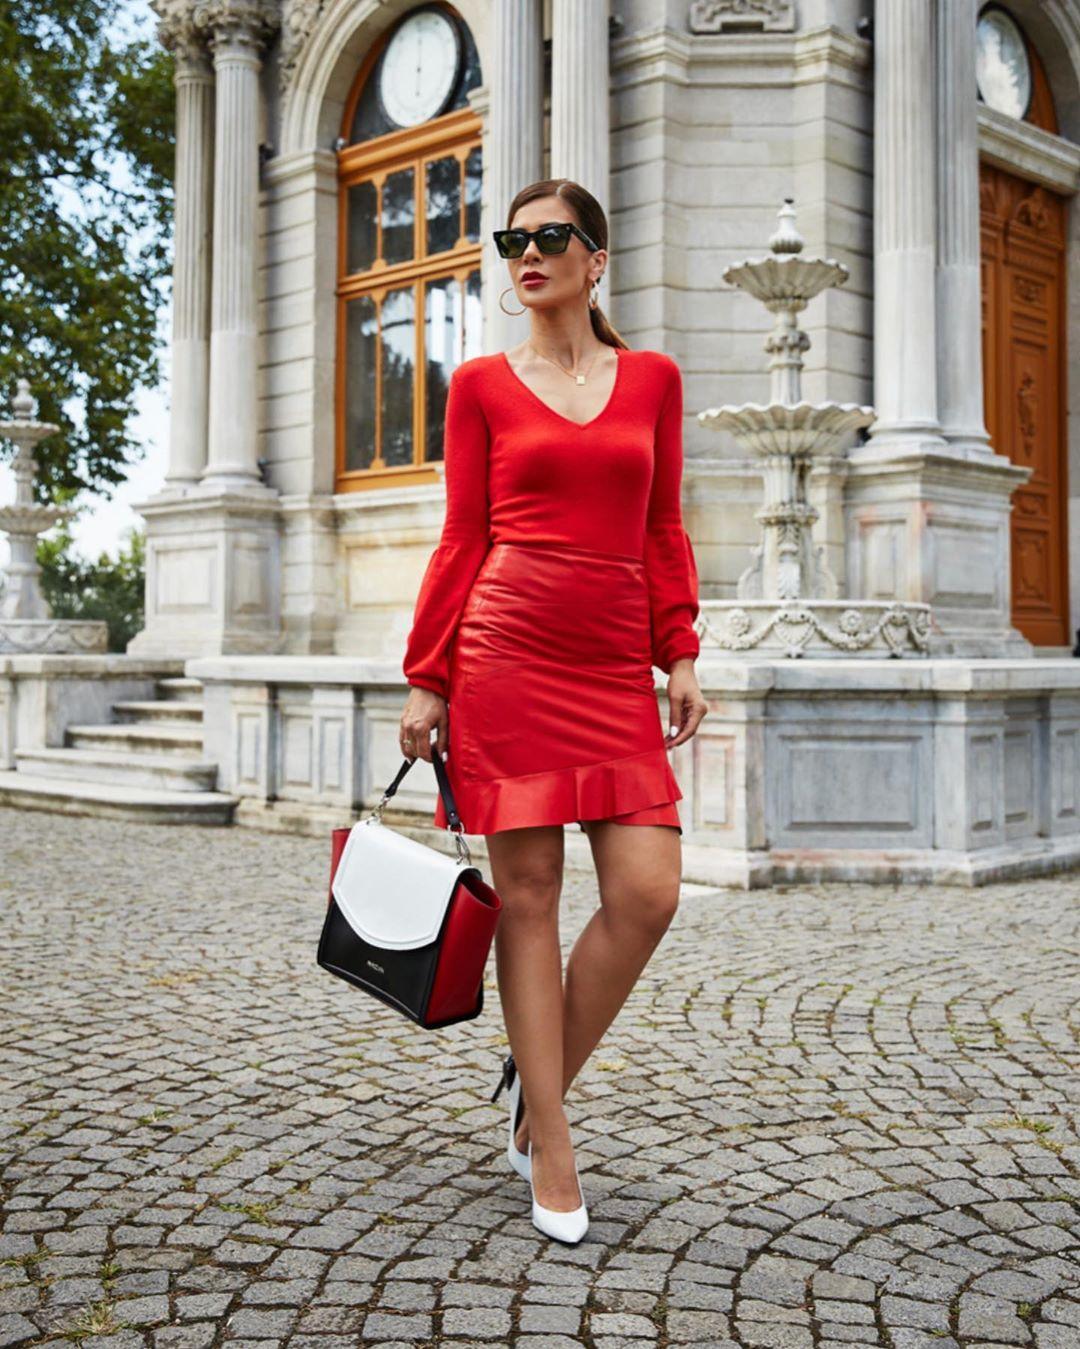 красная юбка 2020 фото 6